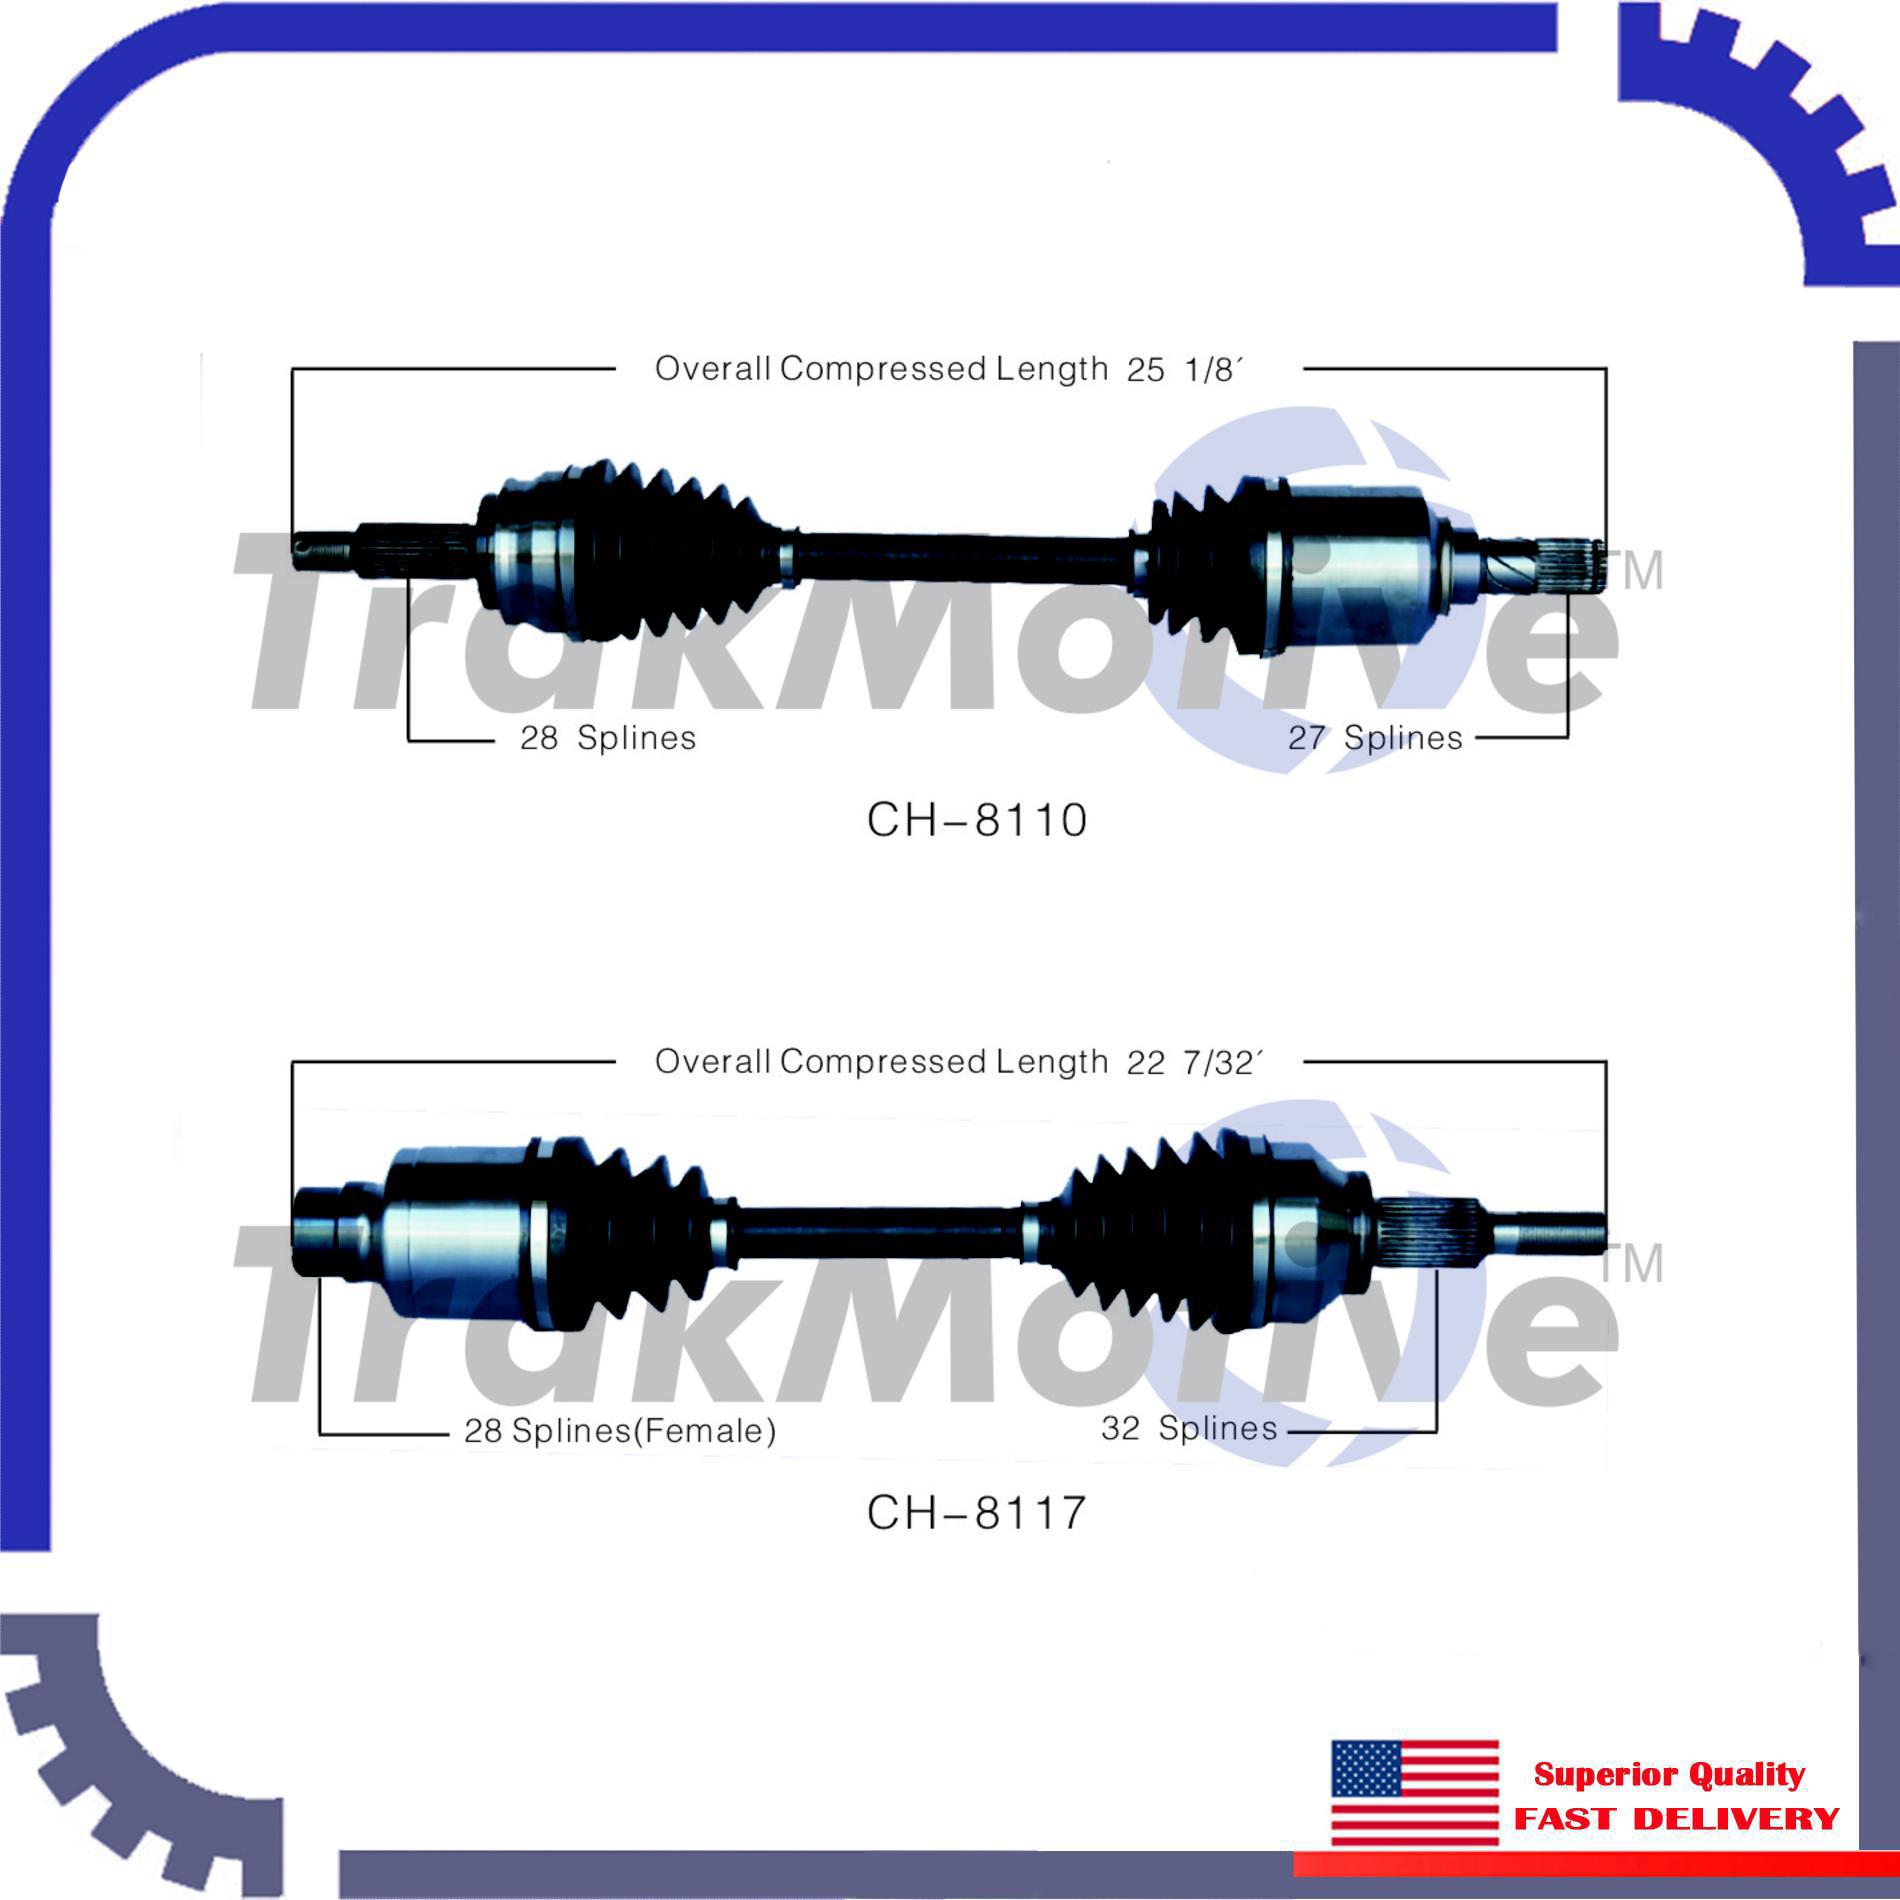 srt4 belt diagram cv axle shaft a pair front left   right for 2008 2009 dodge  cv axle shaft a pair front left   right